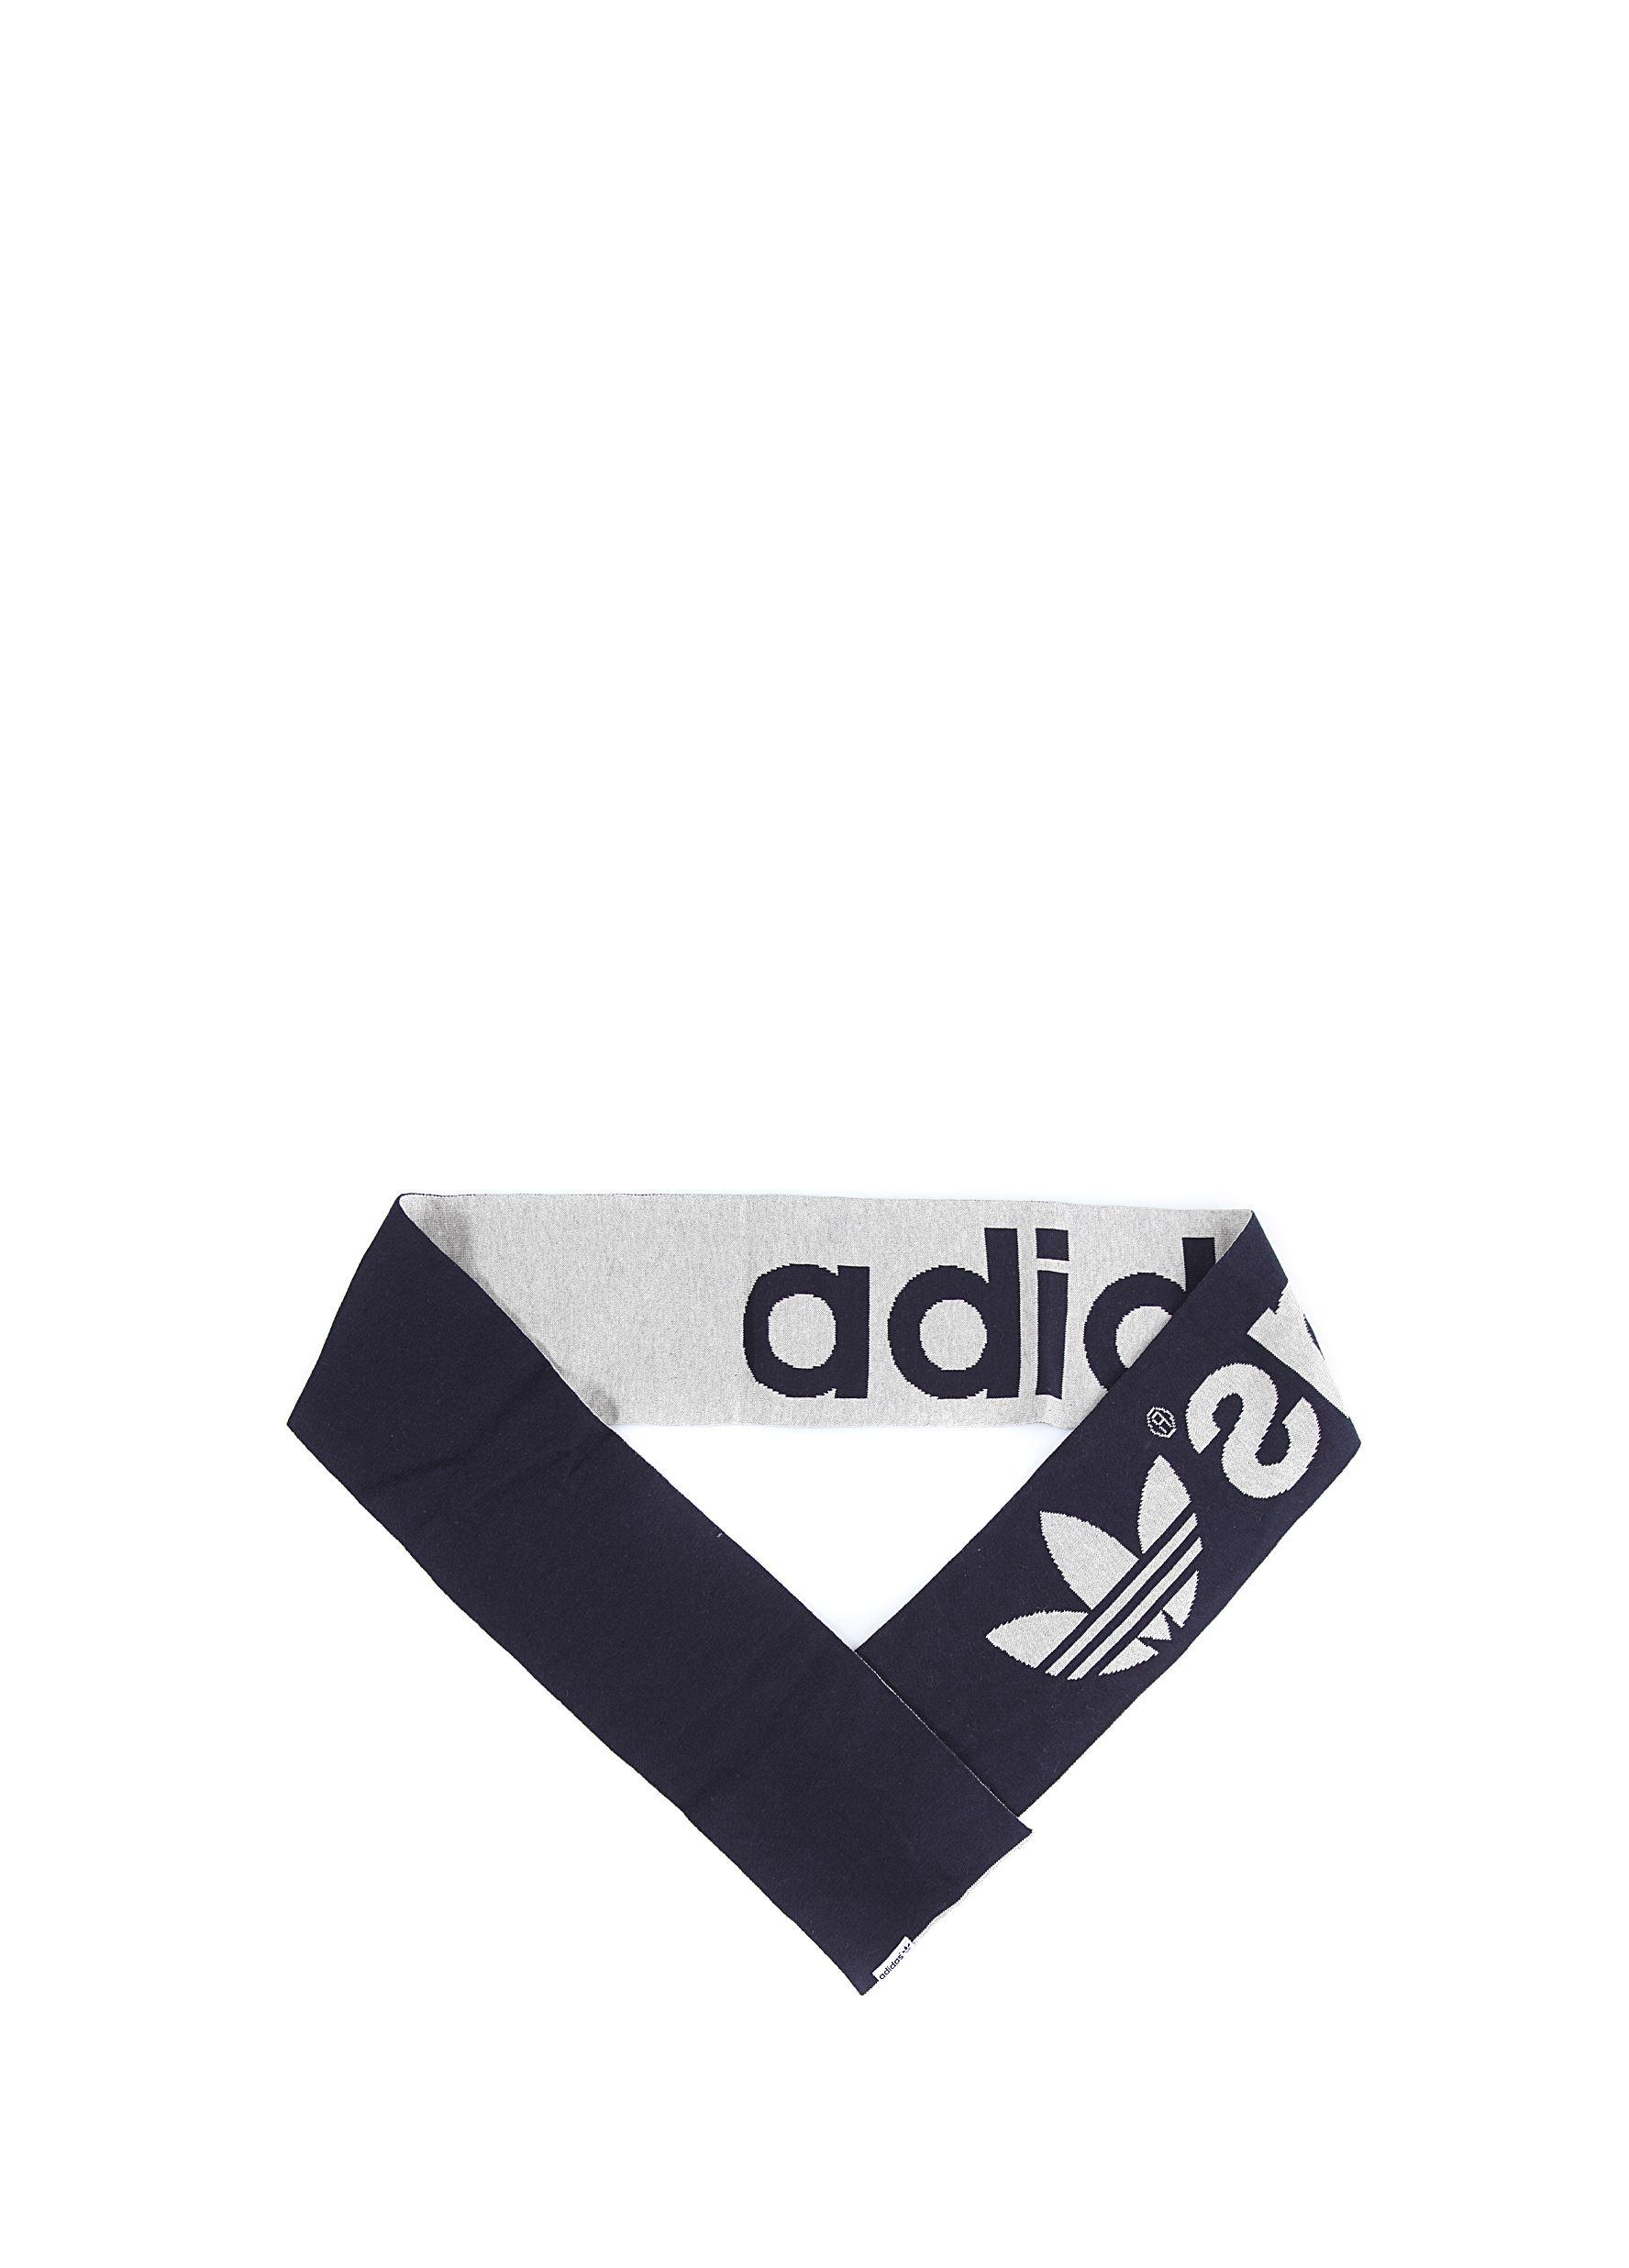 Adidas & Reebok Accessories - Unisex Κασκόλ ADIDAS